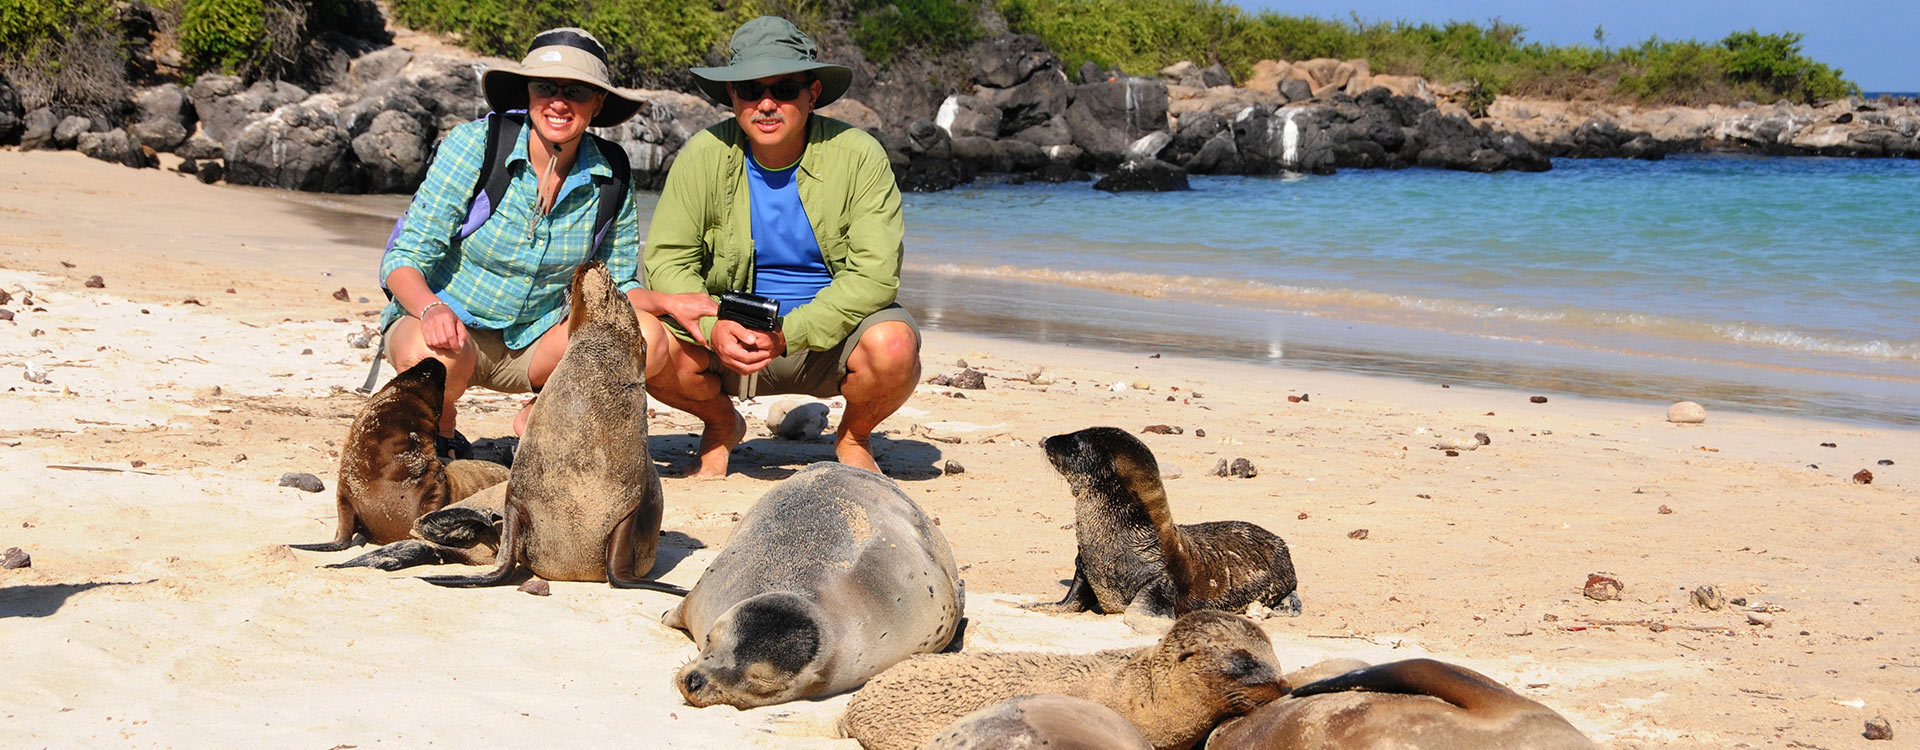 Ecuador & Galapagos Highlights 18 days